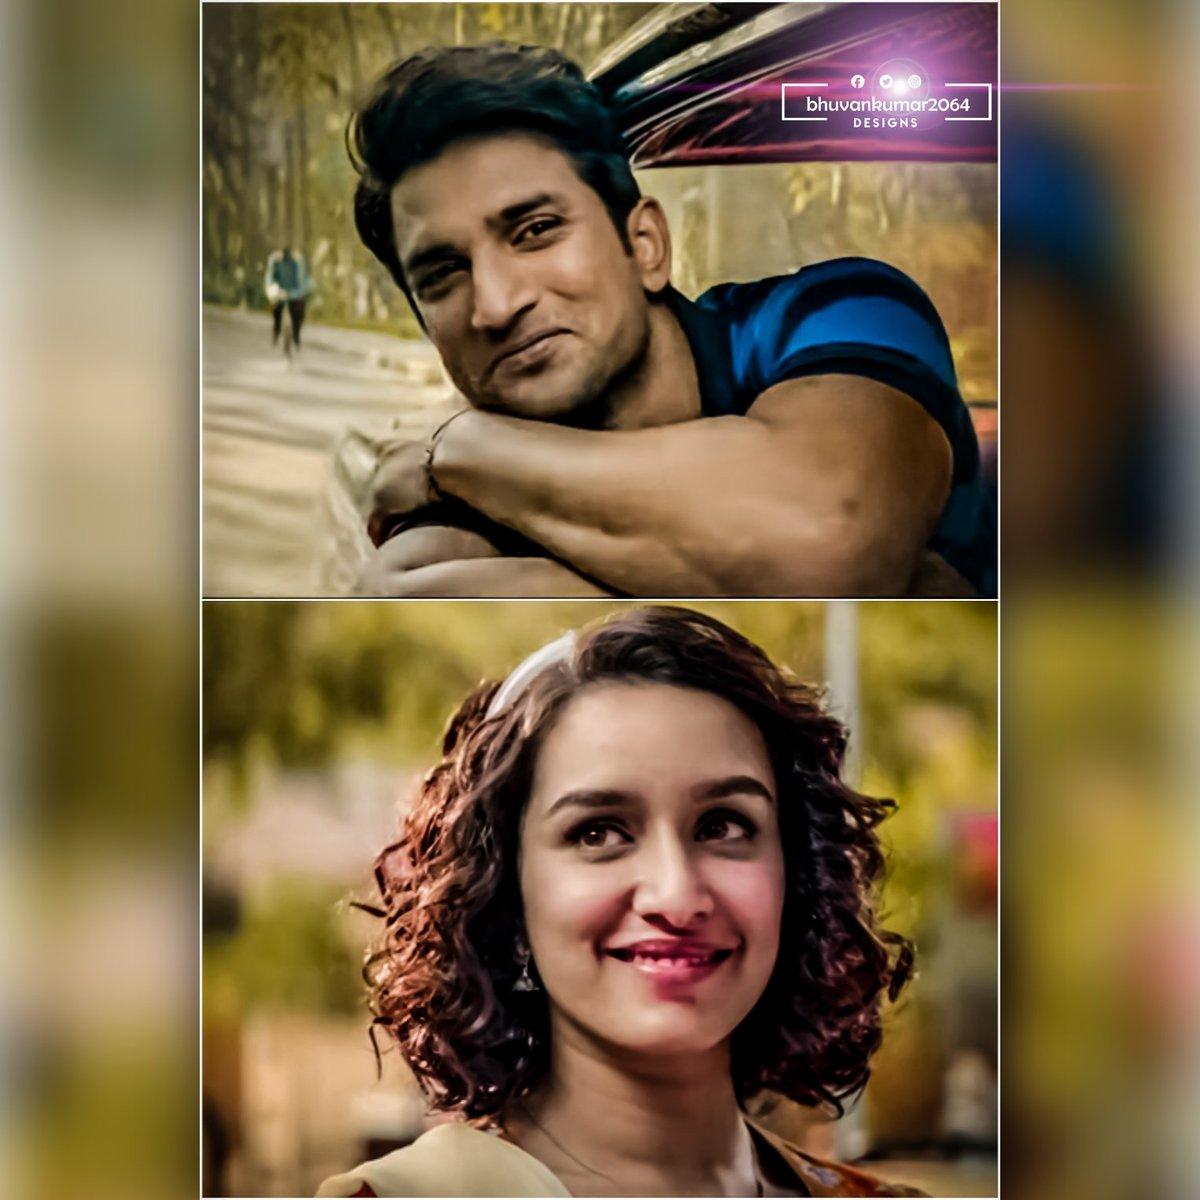 #sushantsinghrajput #chhichhore #movies #theatre #video #movie #film #films #videos #actor #actress #cinema #dvd #amc #instamovies #star #moviestar #photooftheday #hollywood #goodmovie #instagood #flick #flicks #instaflick #instaflickspic.twitter.com/SlIduSsLrX